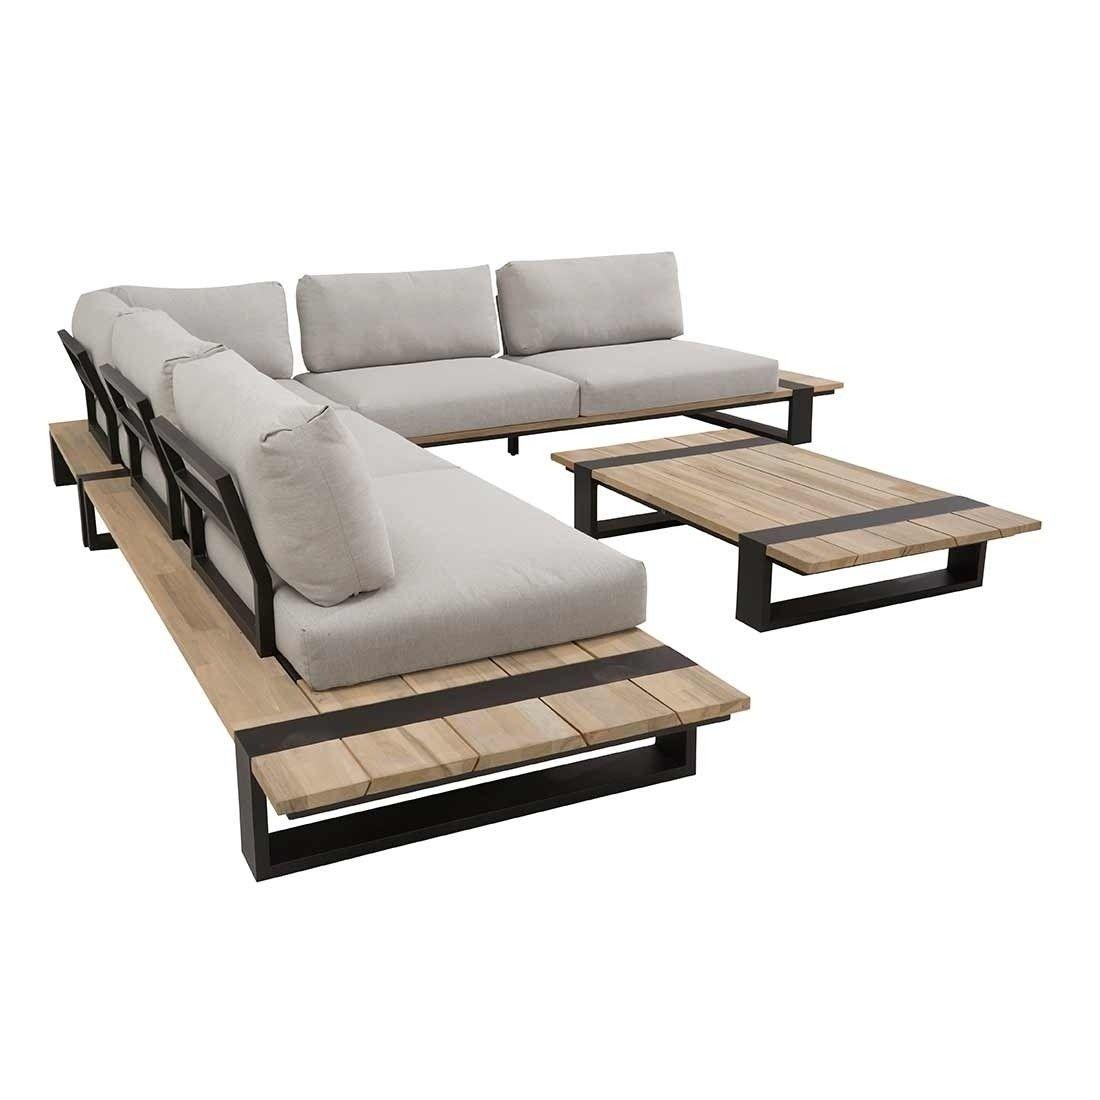 Gartenmobel Design 4seasons Duke Loungemobel Modern Loungeecke 4 Tlg Edelstahl Textil Olefin Outdoormobel Garten Gartenmobel Design Lounge Mobel Moderne Lounge